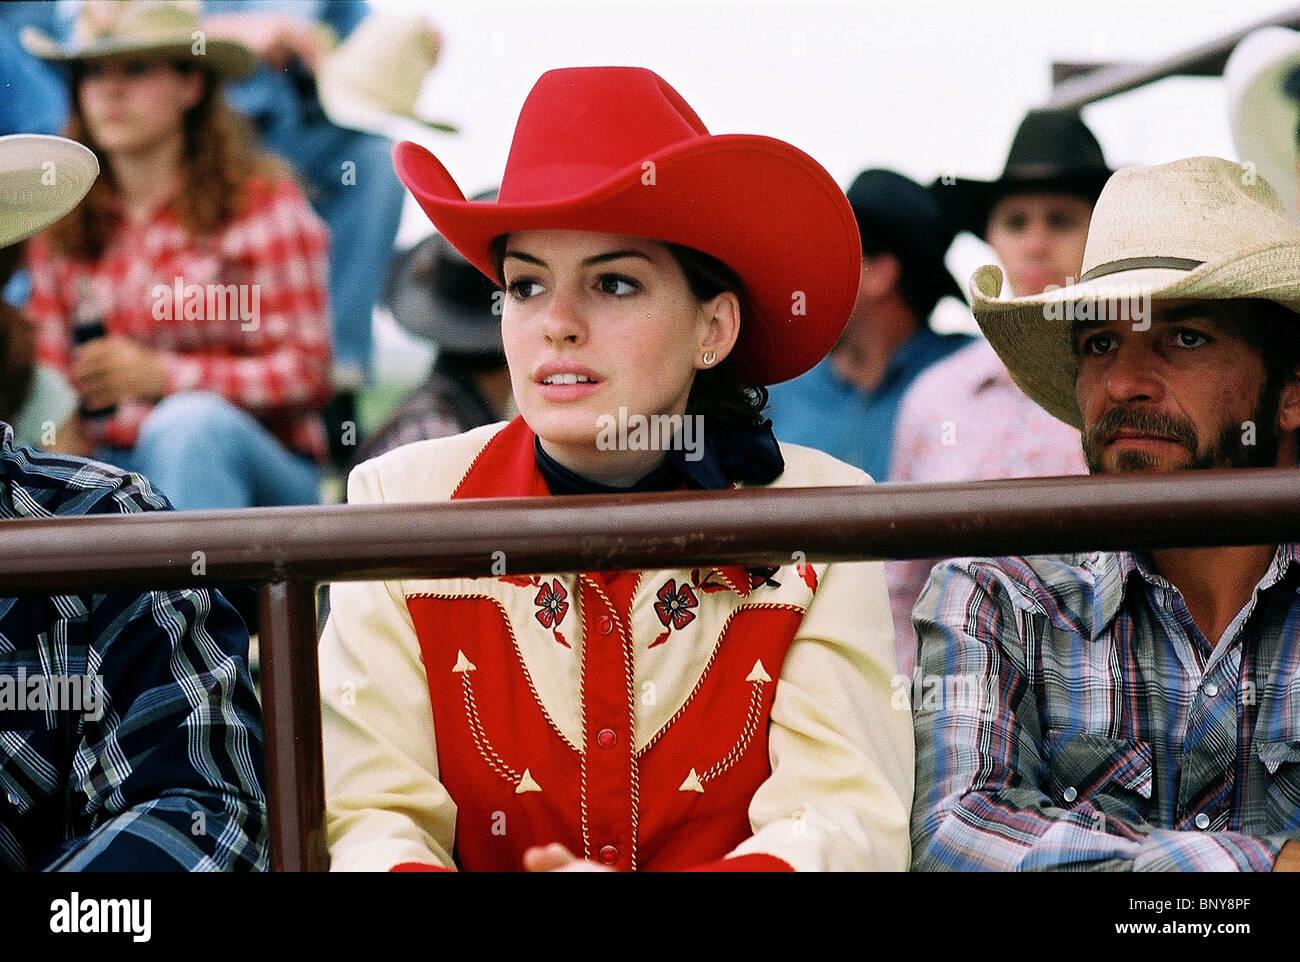 Anne Hathaway Brokeback Mountain 2005 Stock Photo Alamy